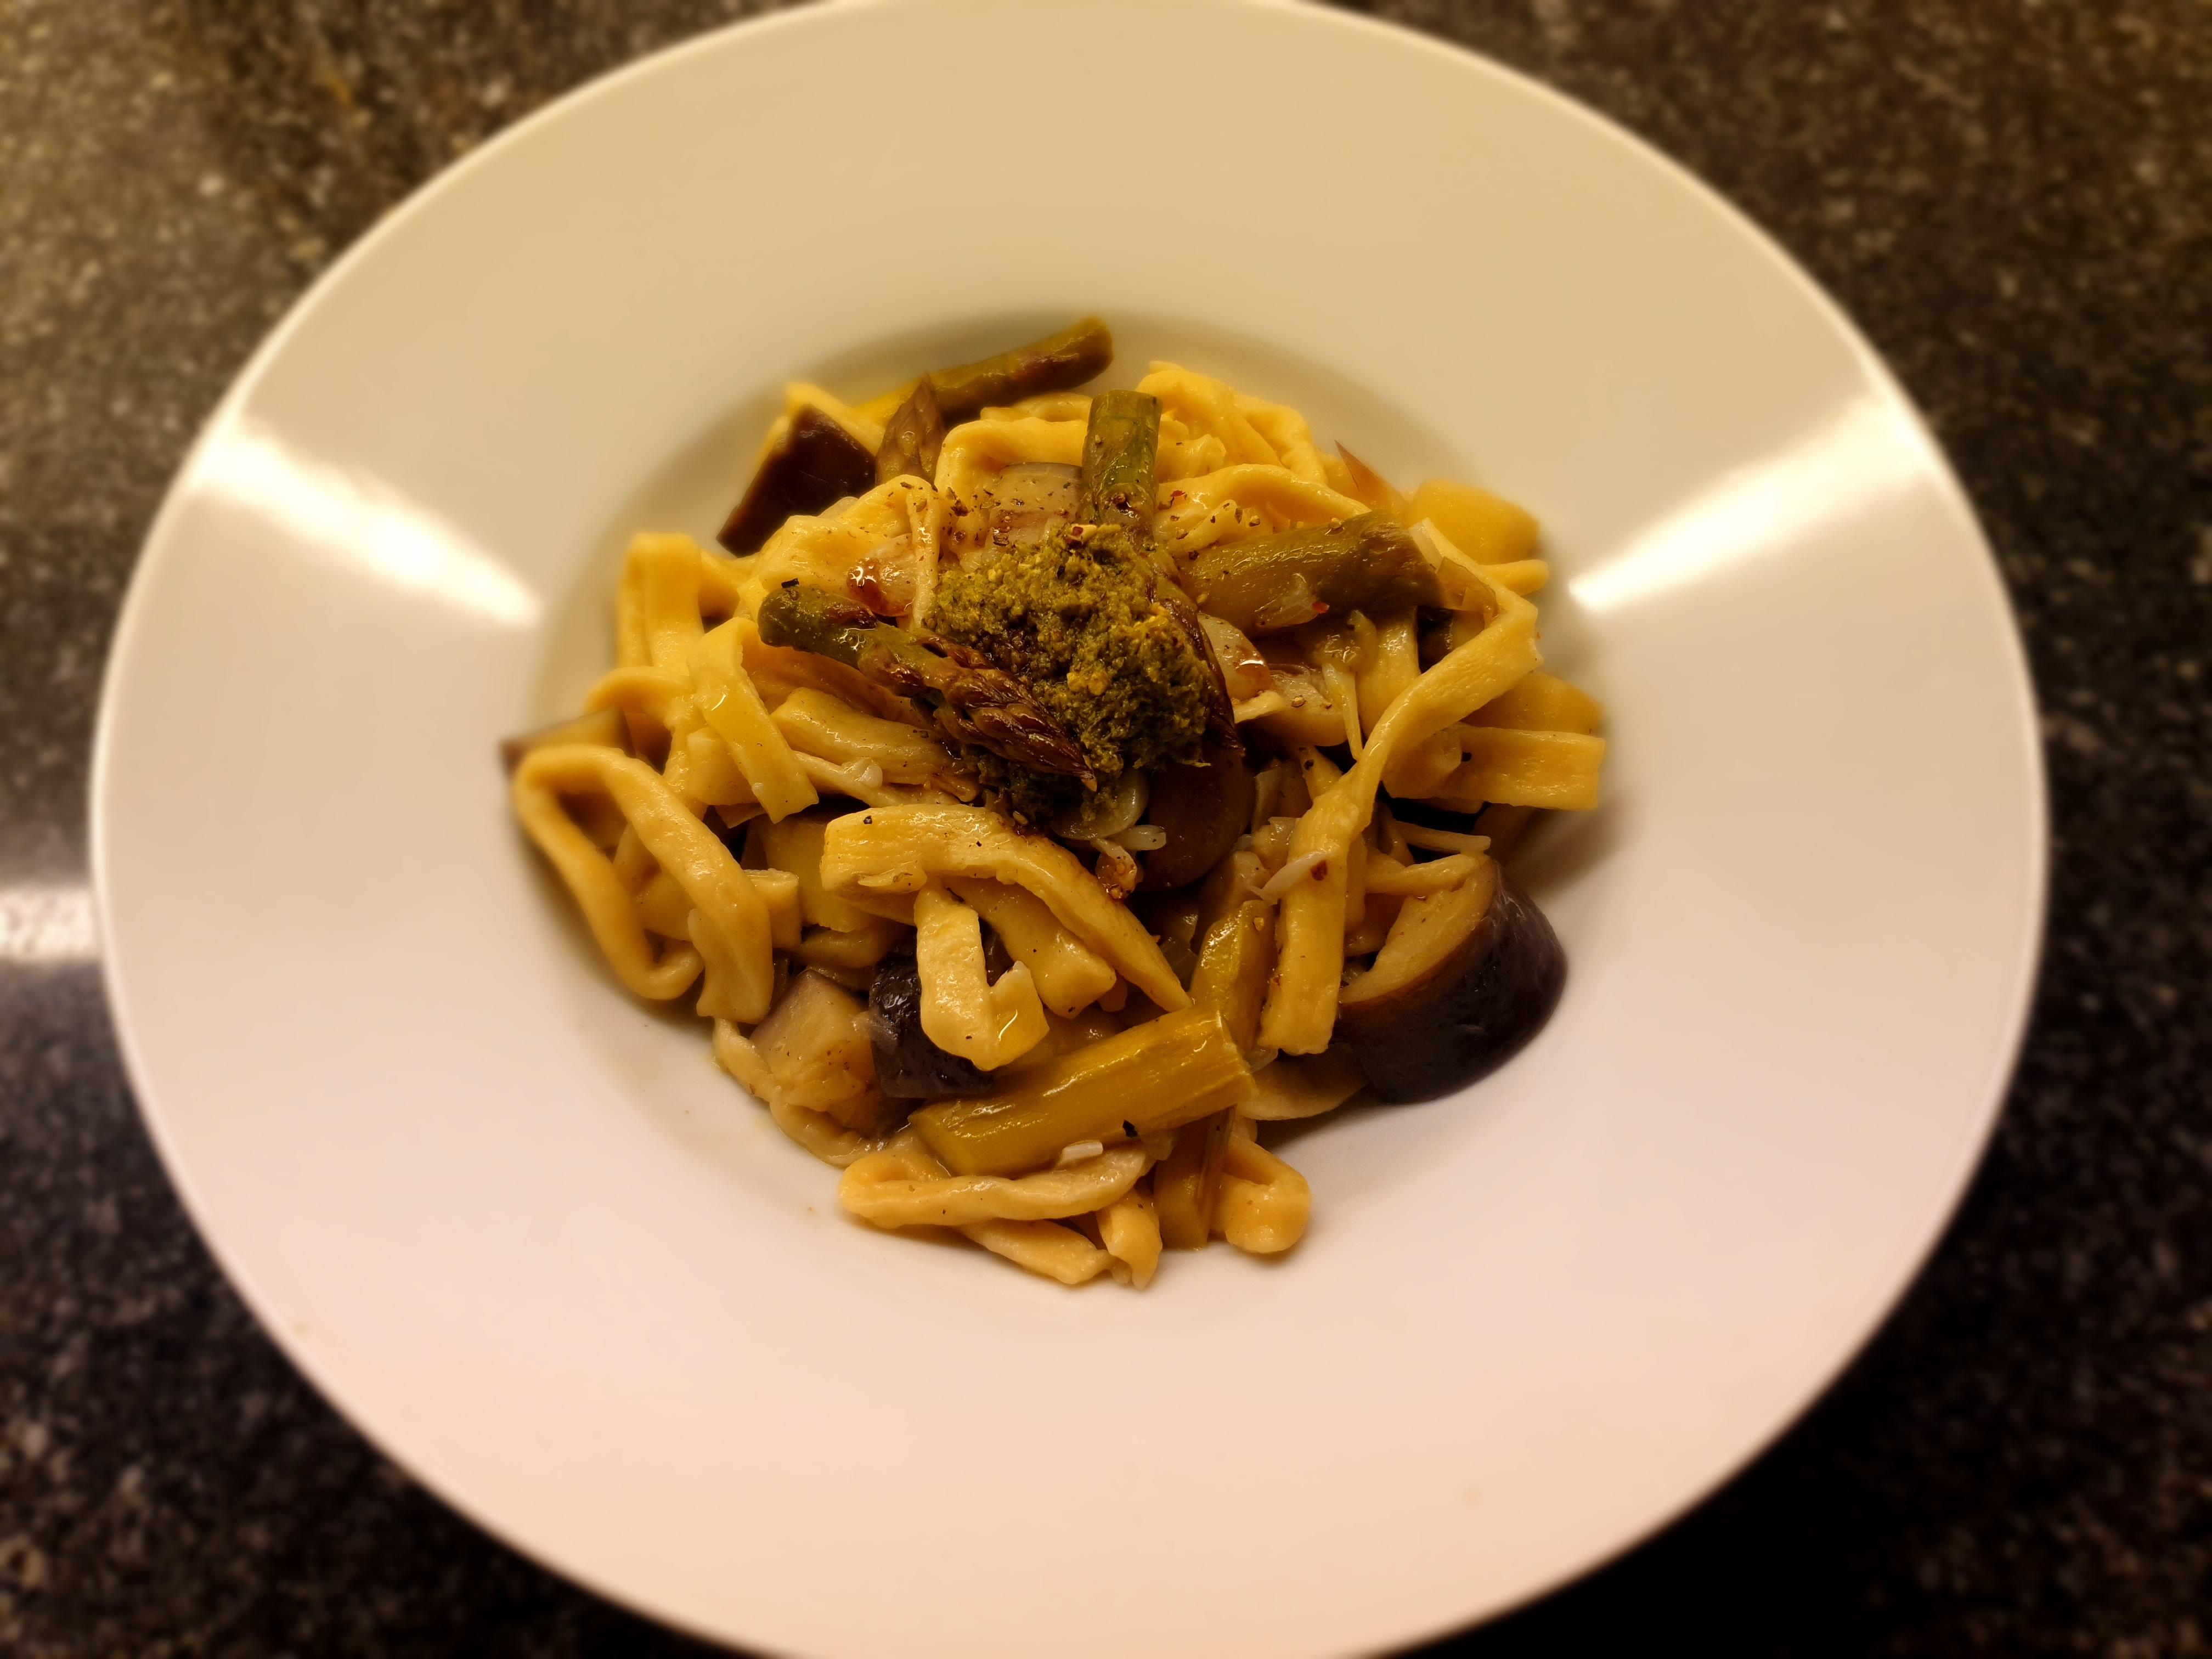 https://foodloader.net/xSh_2020-05-02_Pasta.jpg